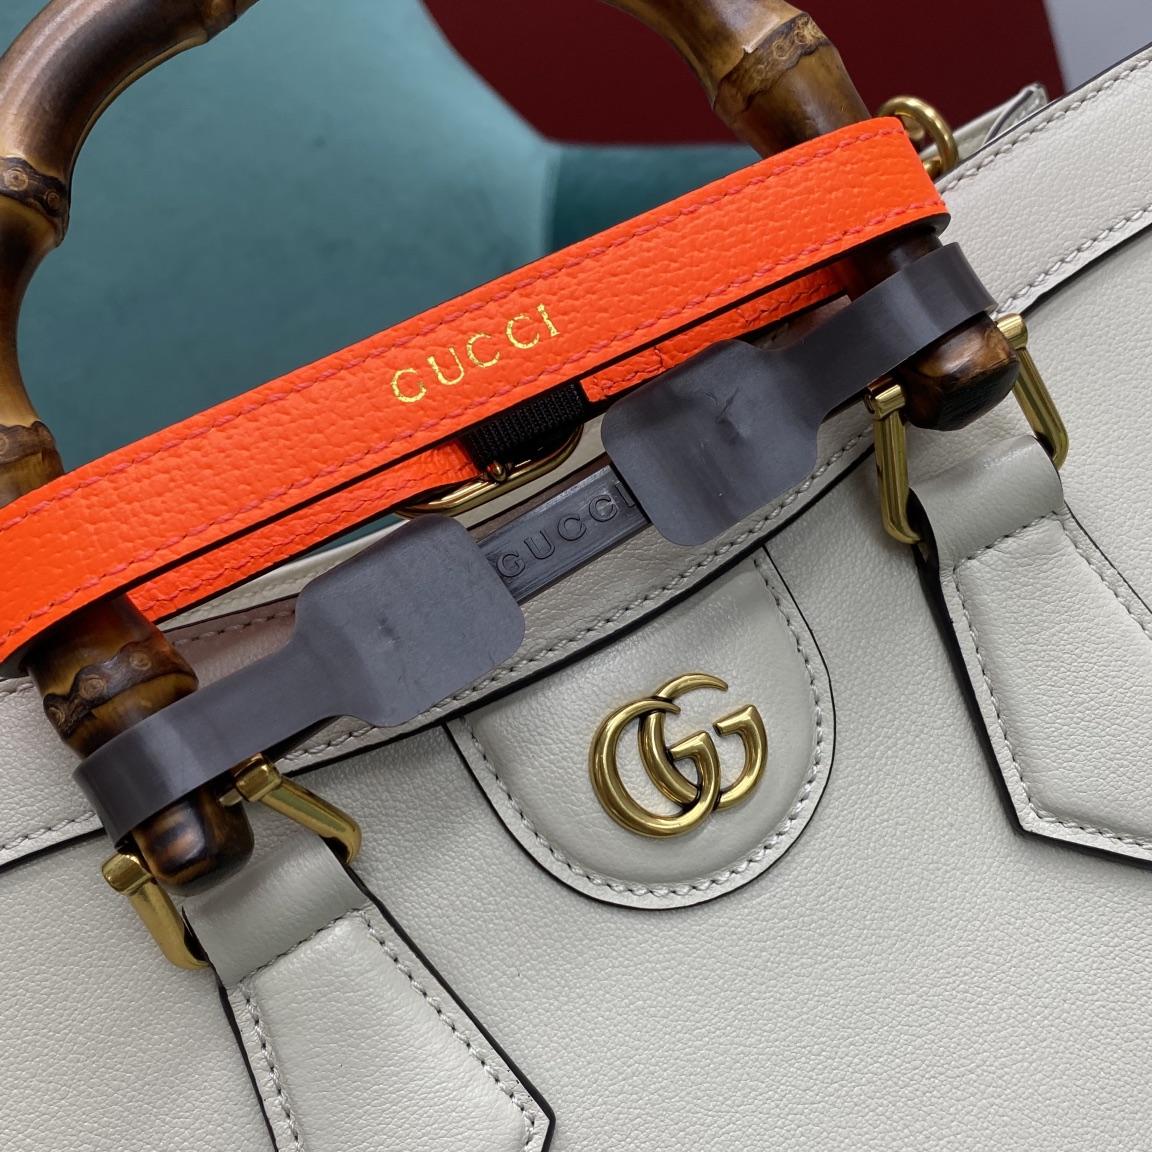 【P1430】古驰包包官网 Gucci Diana竹节包660195白色牛皮手提包27CM